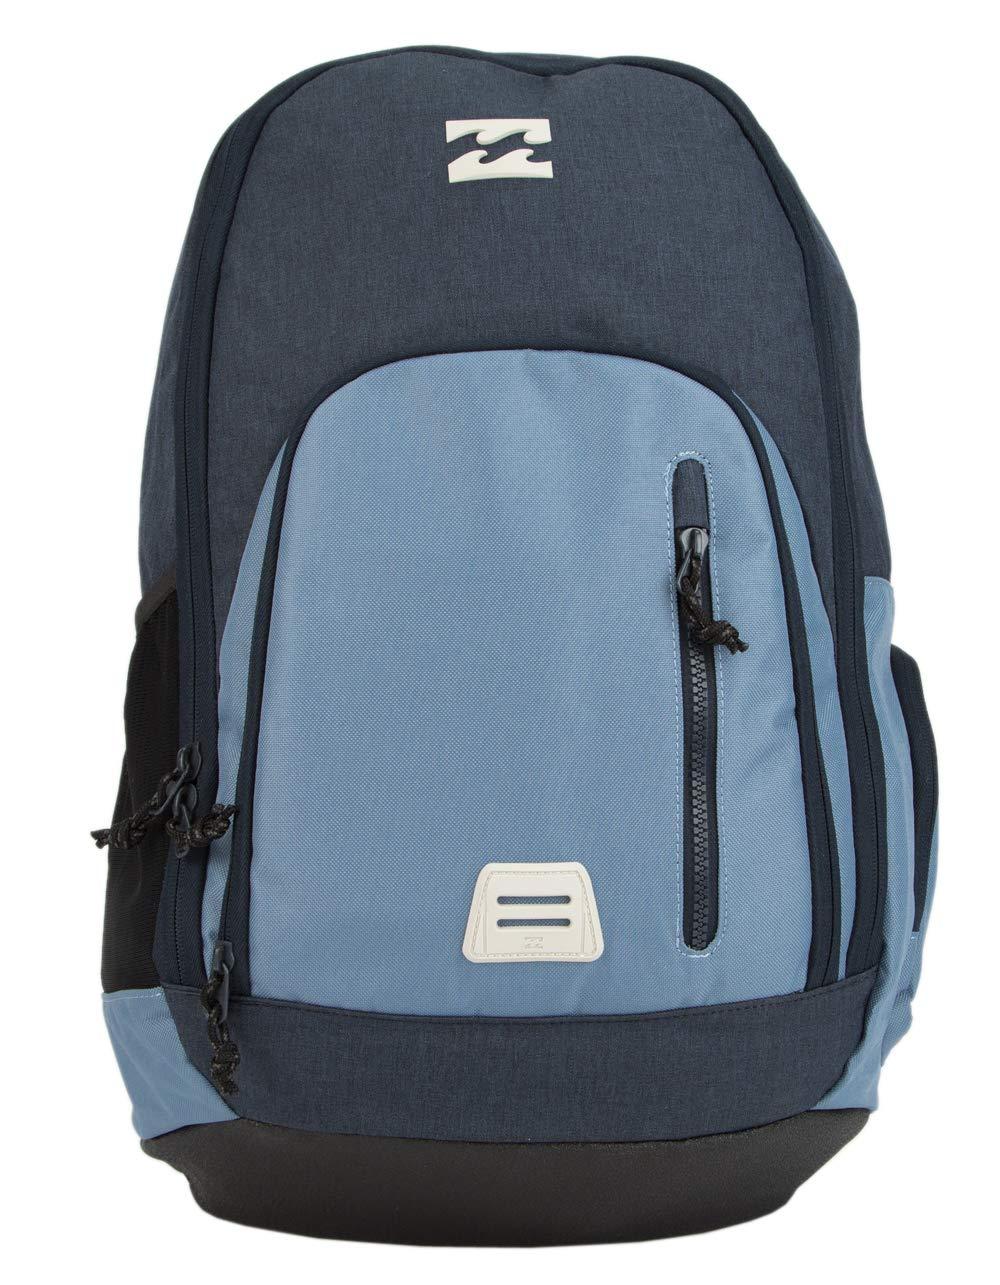 Billabong Men's Command Pack '19 Backpacks,One Size,Navy Heather by Billabong